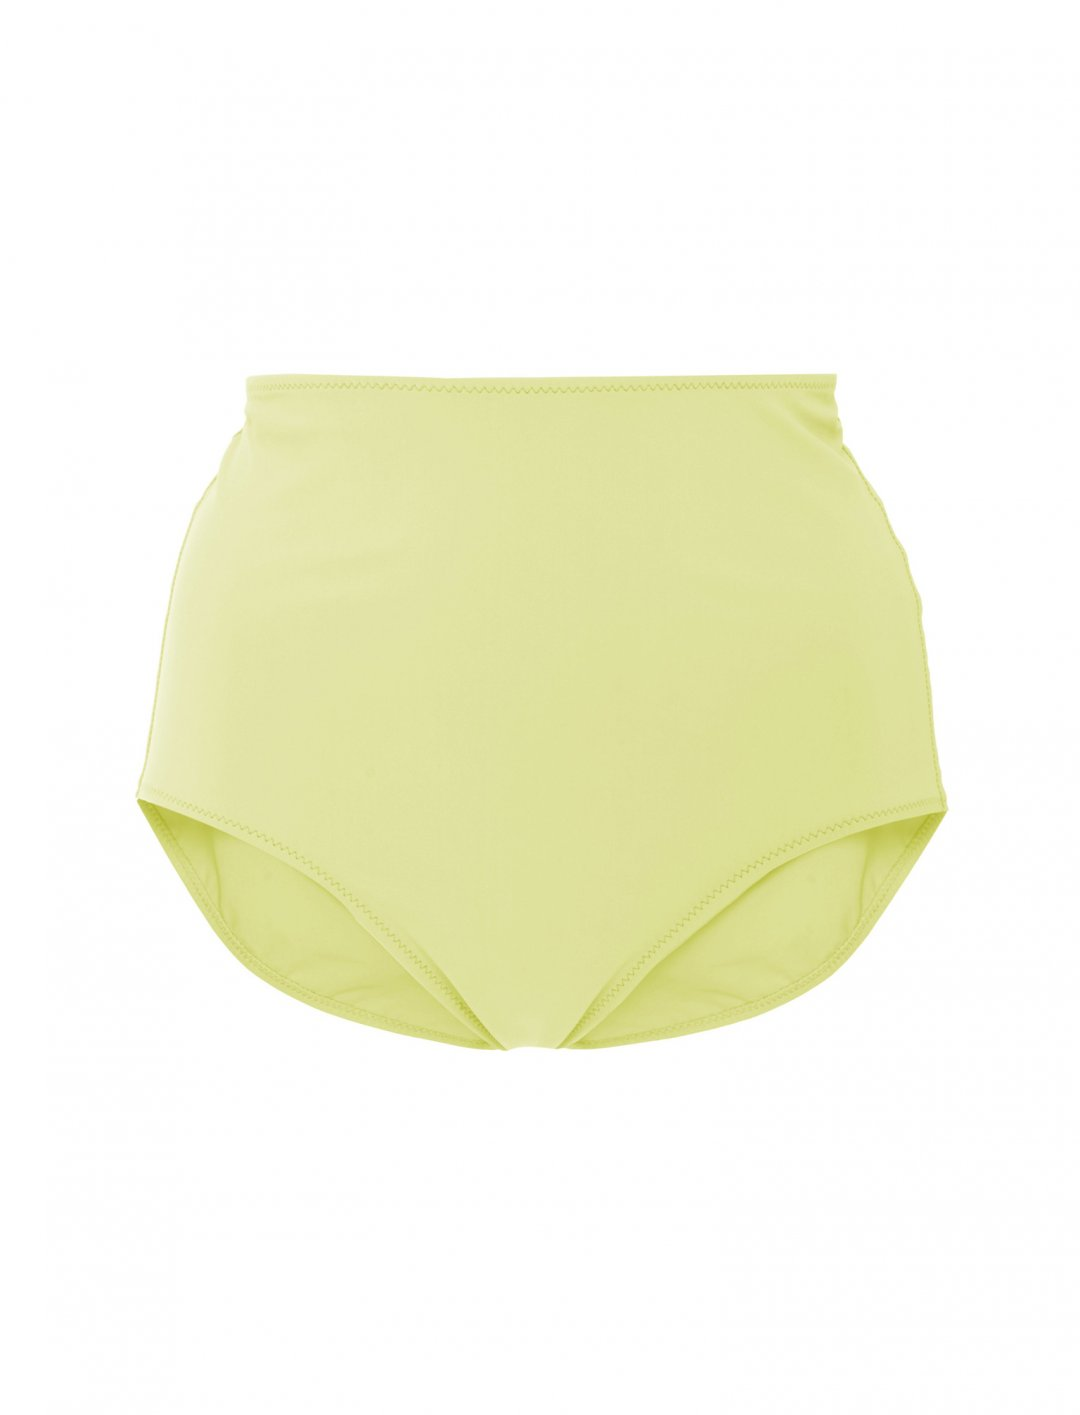 "Zara Larsson's Bikini Bottoms {""id"":5,""product_section_id"":1,""name"":""Clothing"",""order"":5} Araks"